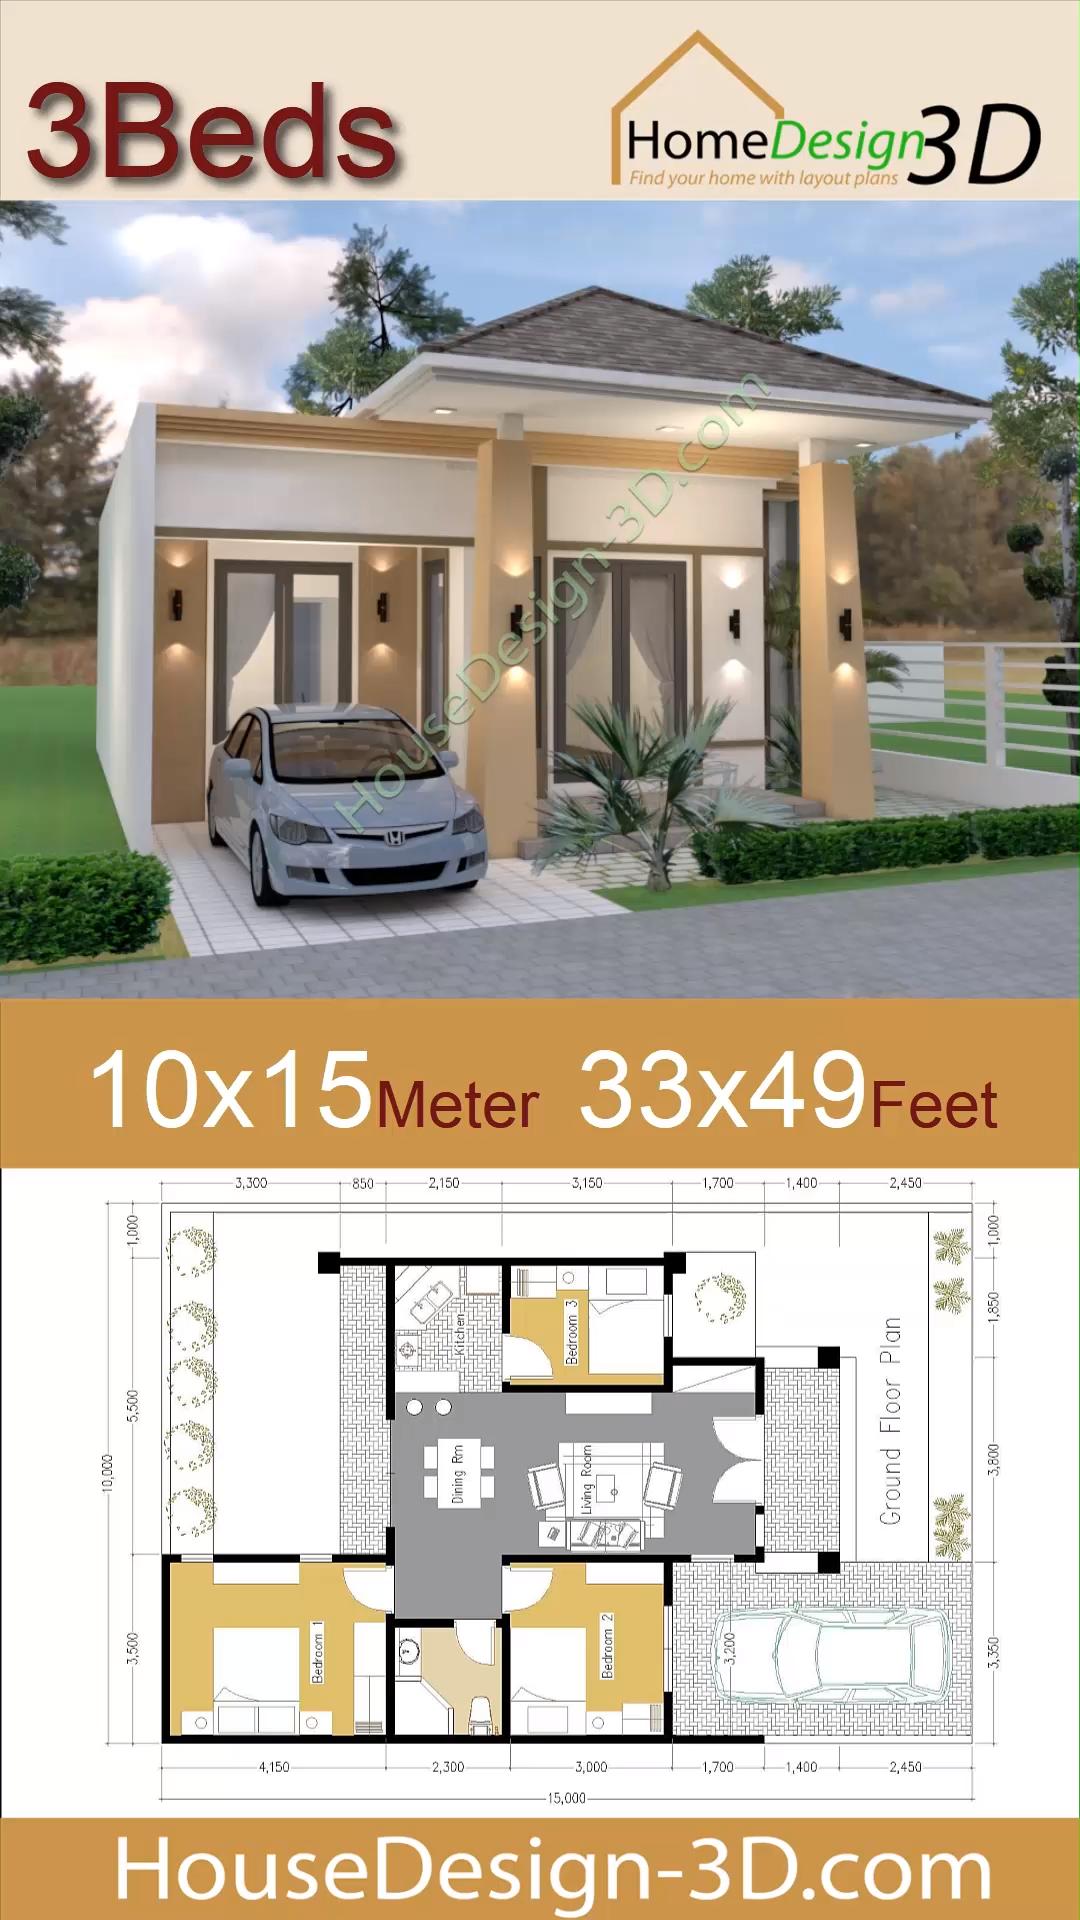 Video House Design 10x15 Meters 33x49 Feet With 3 Bedrooms Arsitektur Rumah Dekorasi Rumah Pedesaan Arsitektur